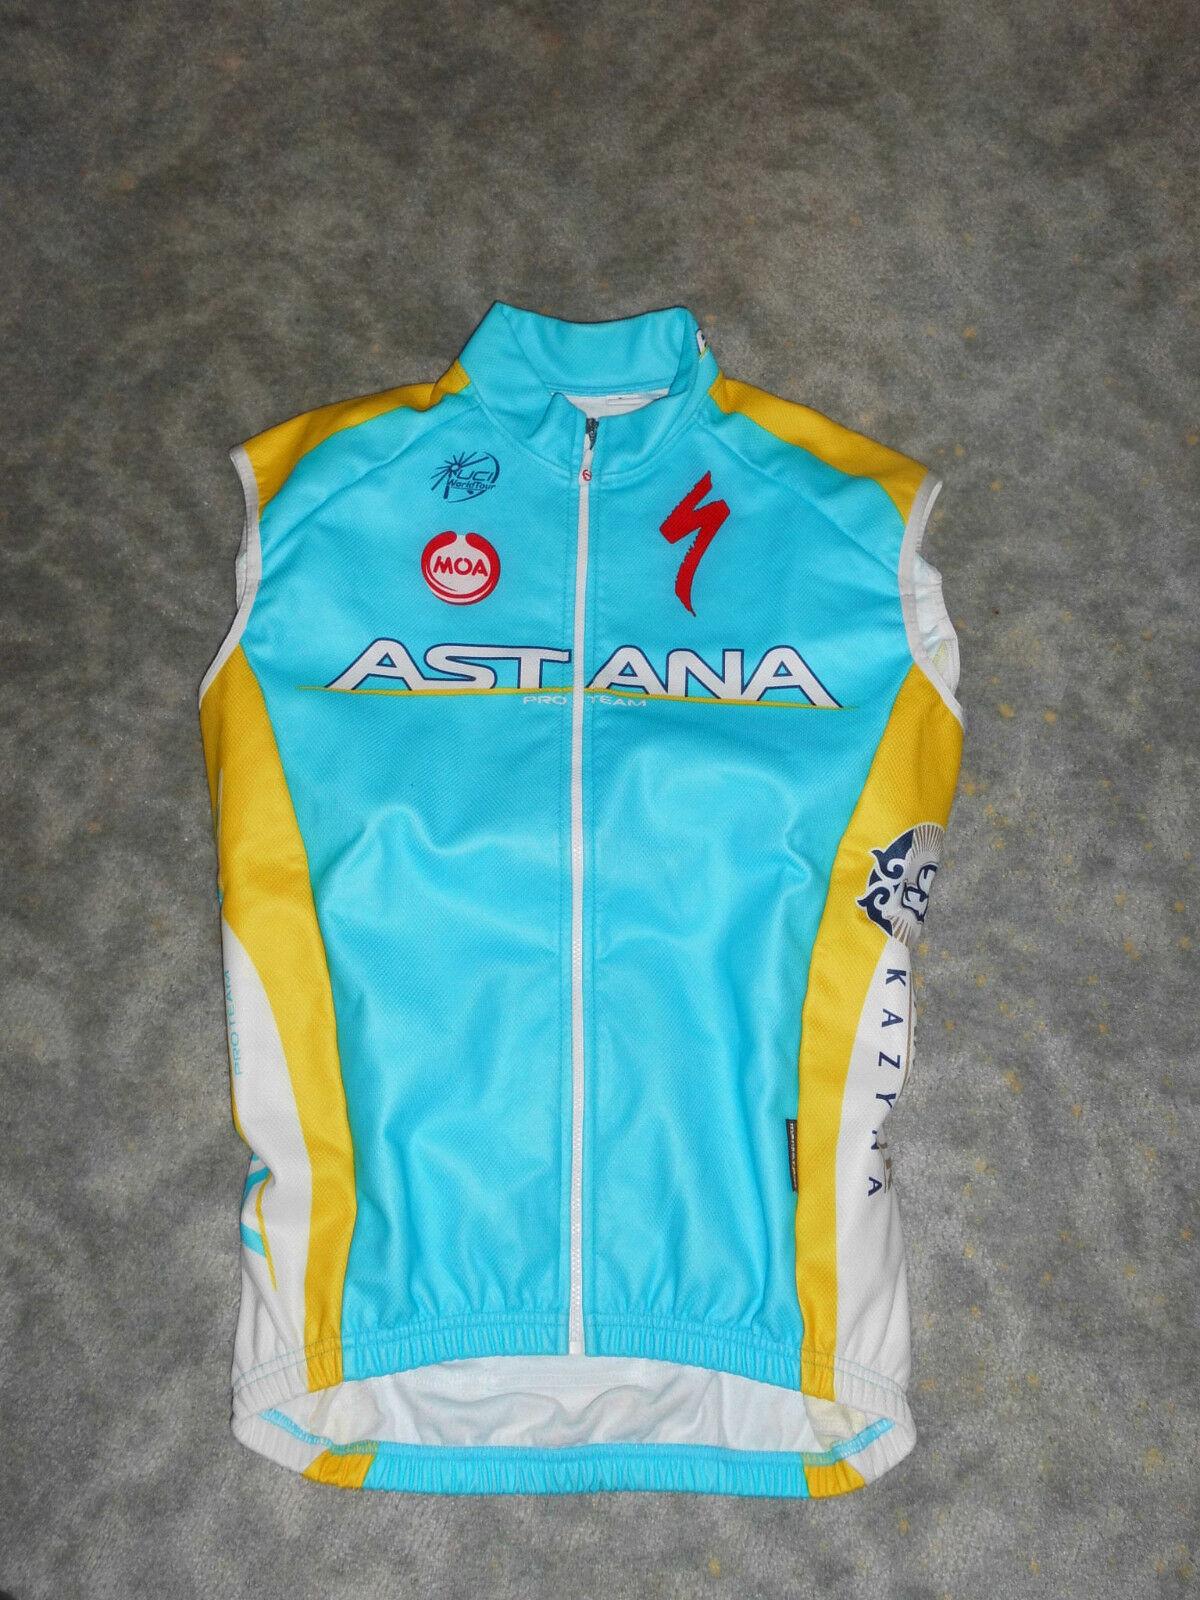 Original MOA Team Astana Specialized thermo Winter Weste MantoTex Windstopper